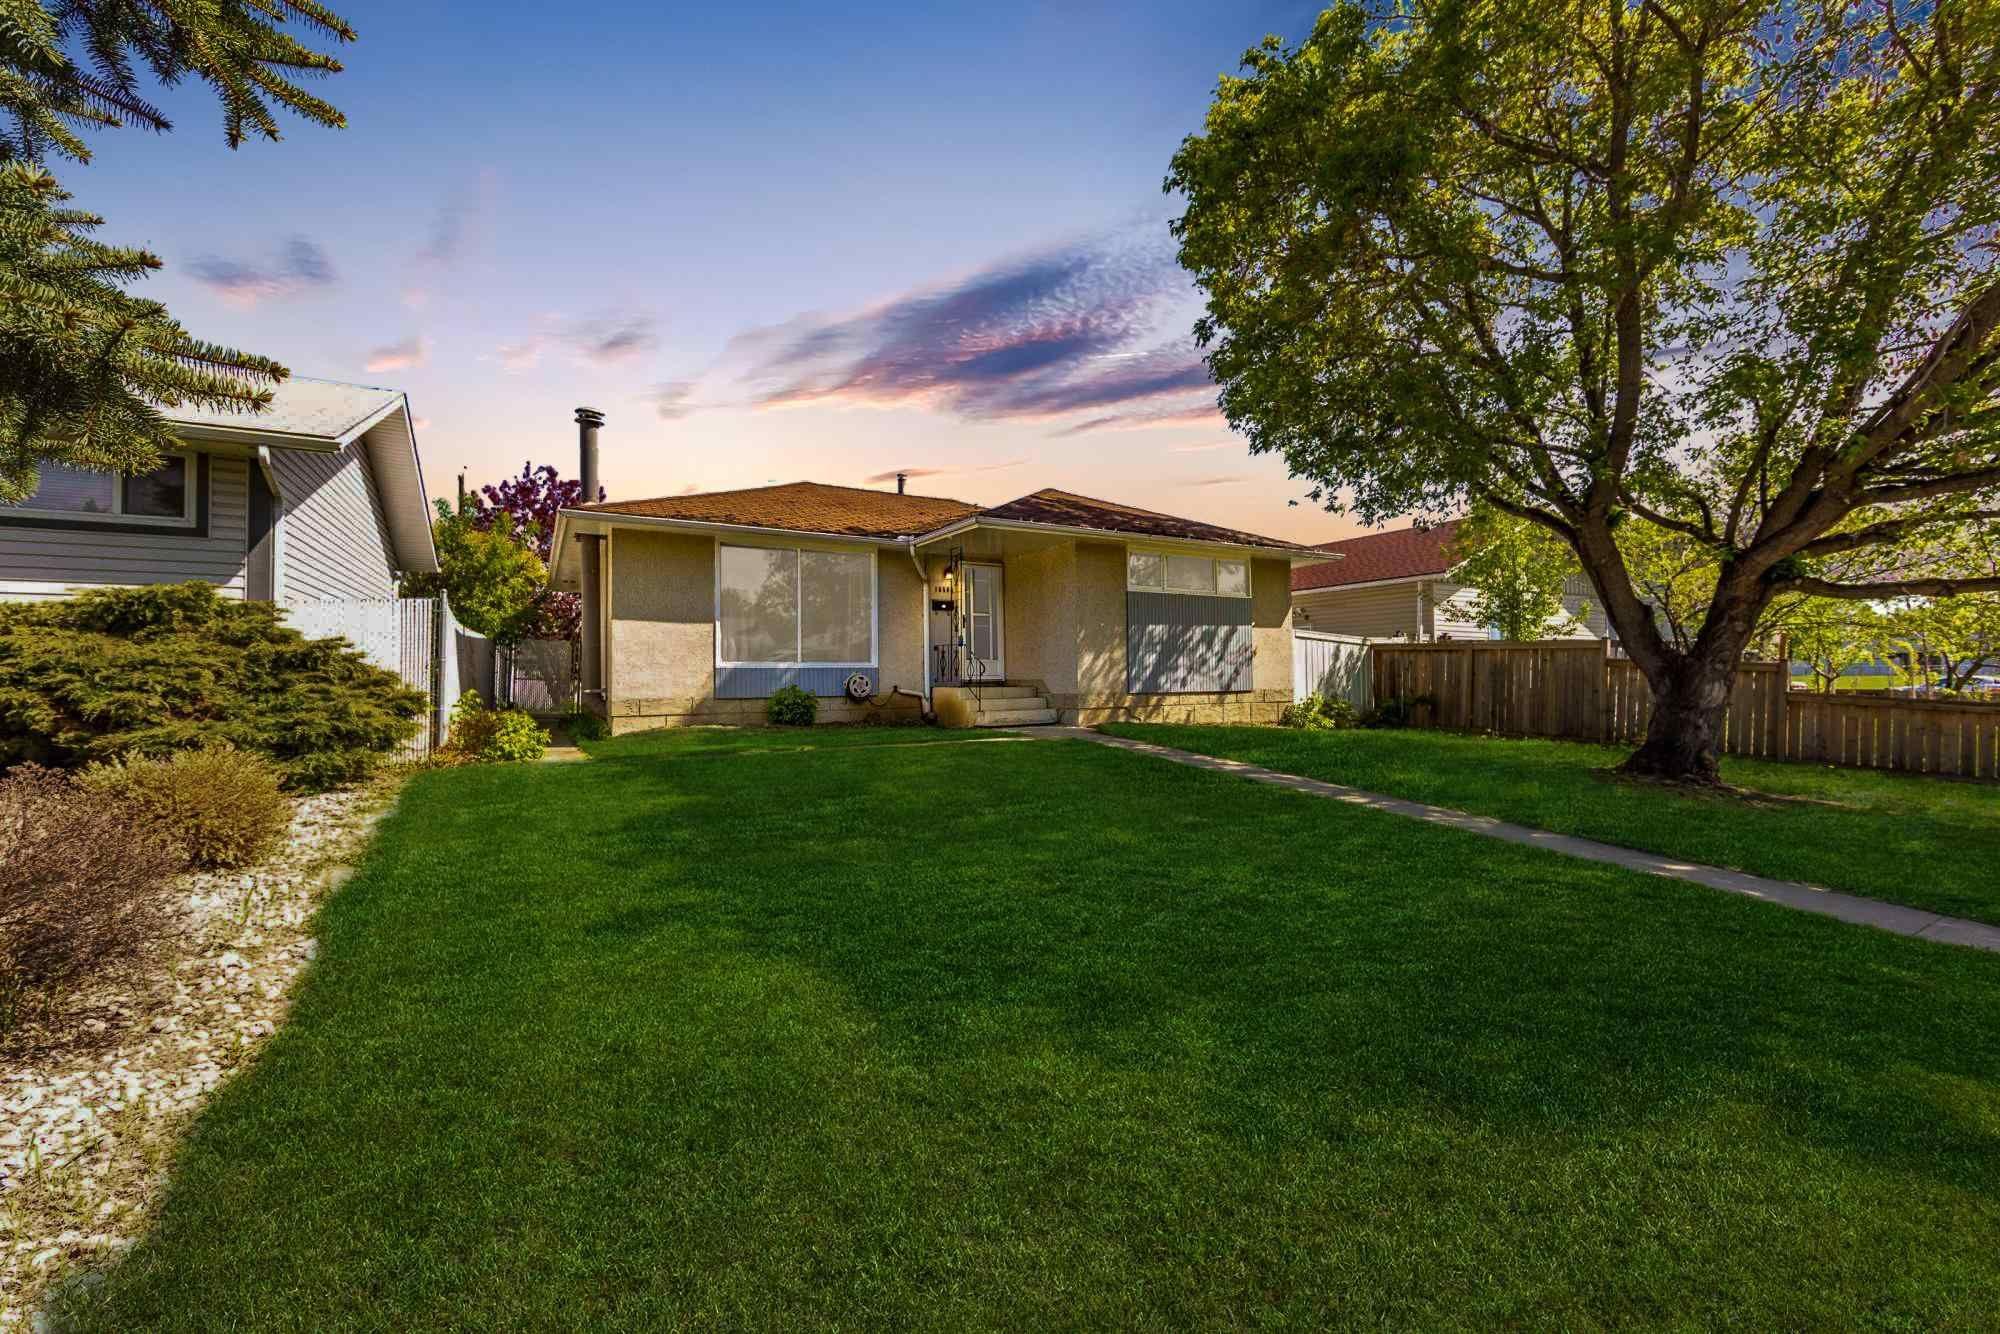 Main Photo: 16504 90 Avenue in Edmonton: Zone 22 House for sale : MLS®# E4247433